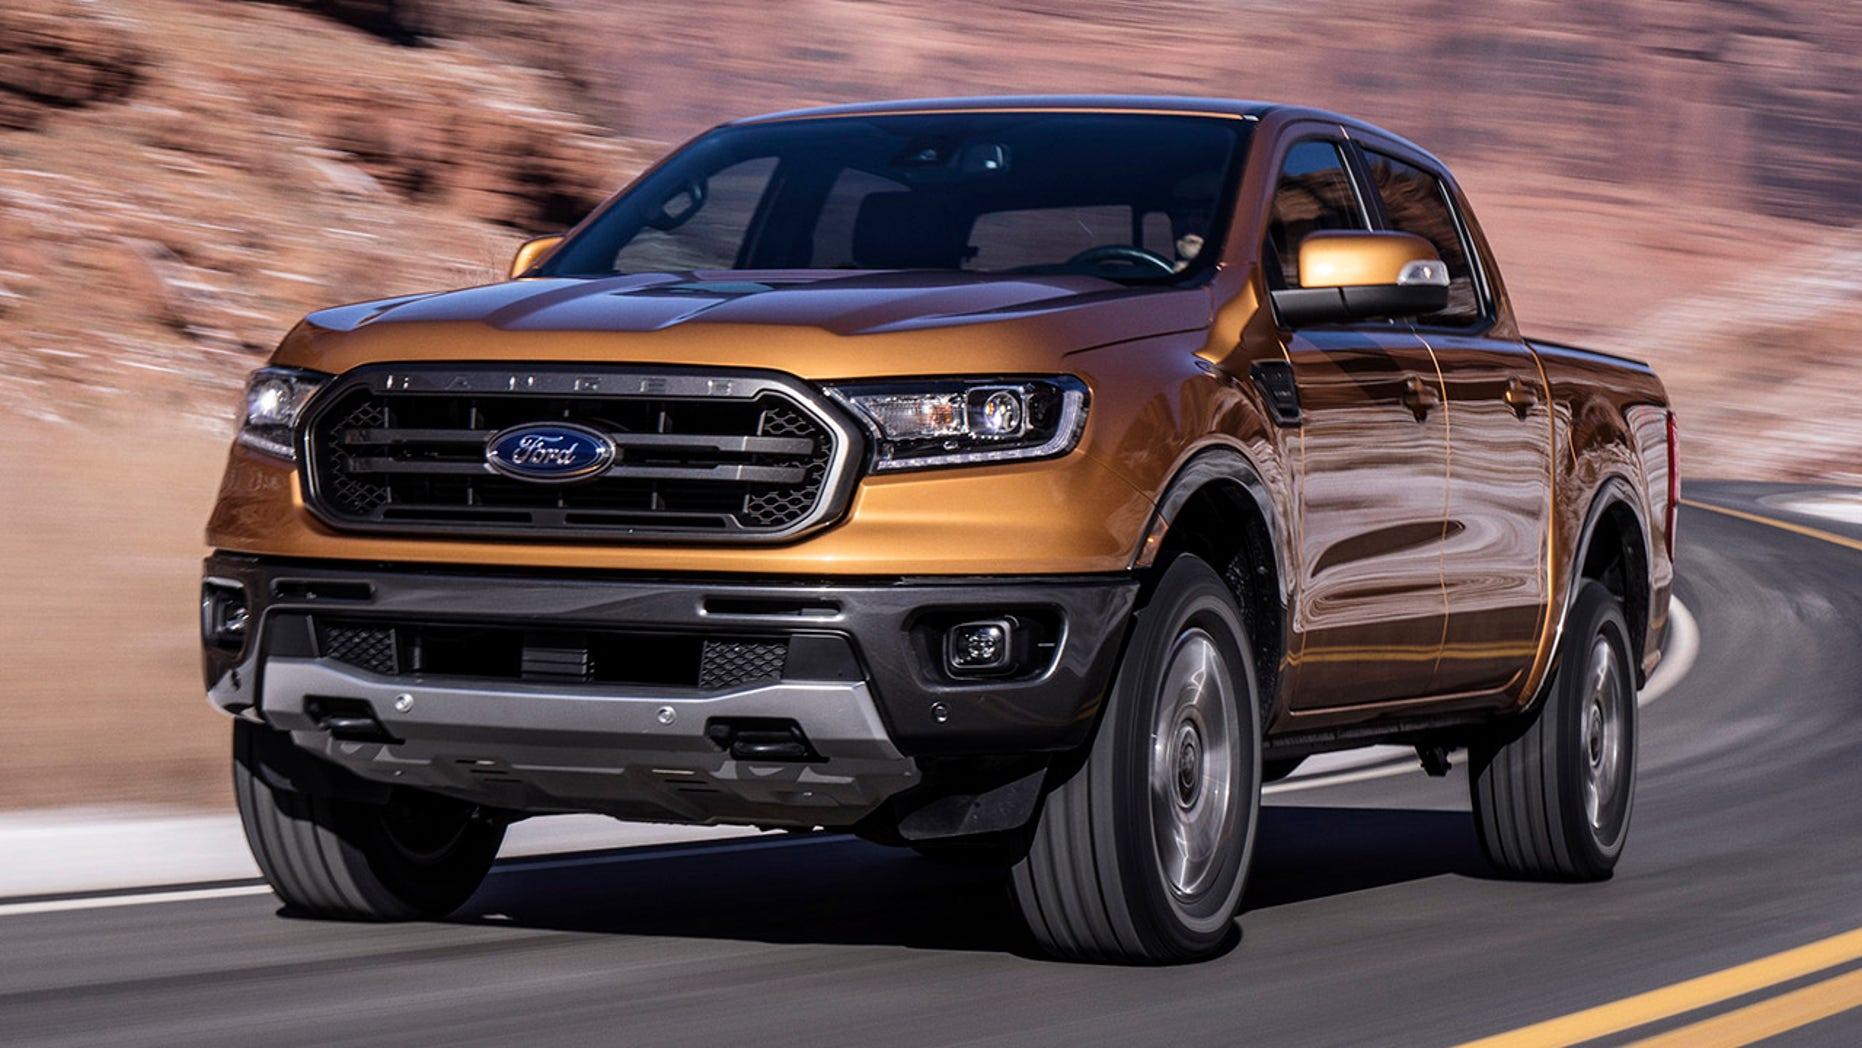 2019 ford ranger scores highest fuel economy rating